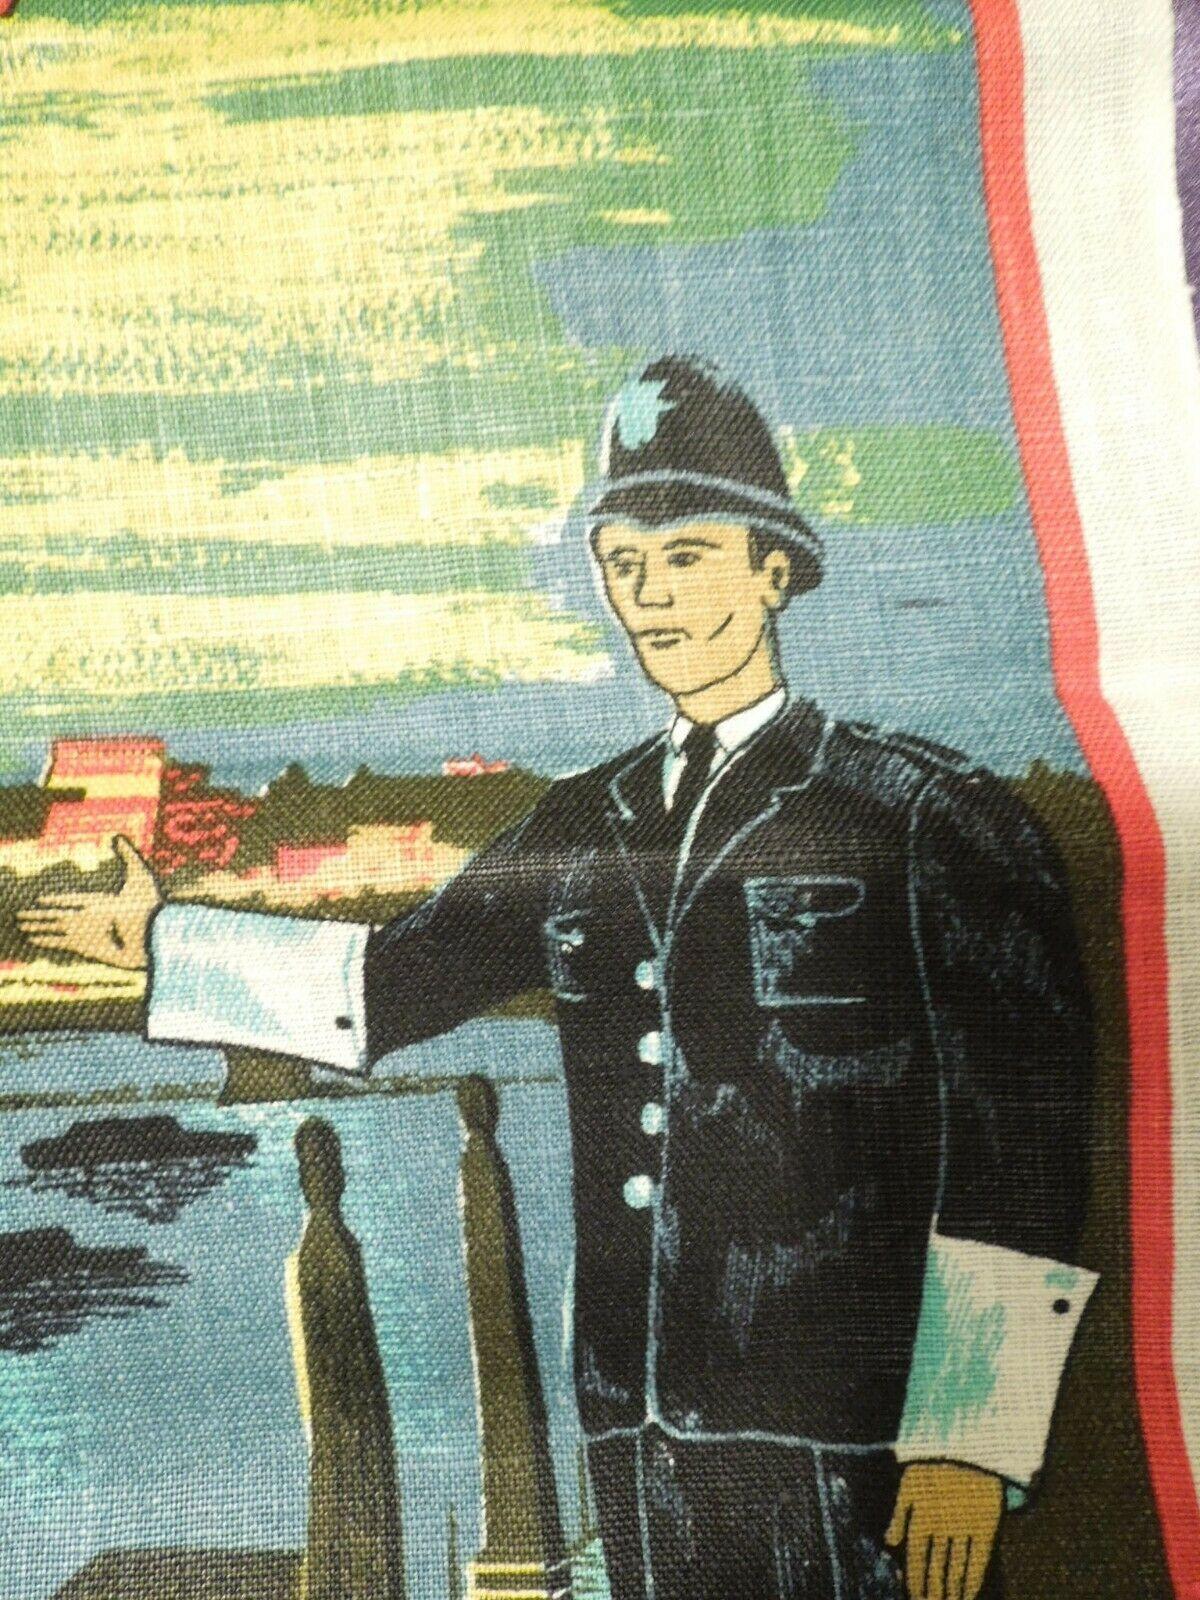 Vintage London by Night by Blackstaff Pure Irish Linen Towel Art image 9